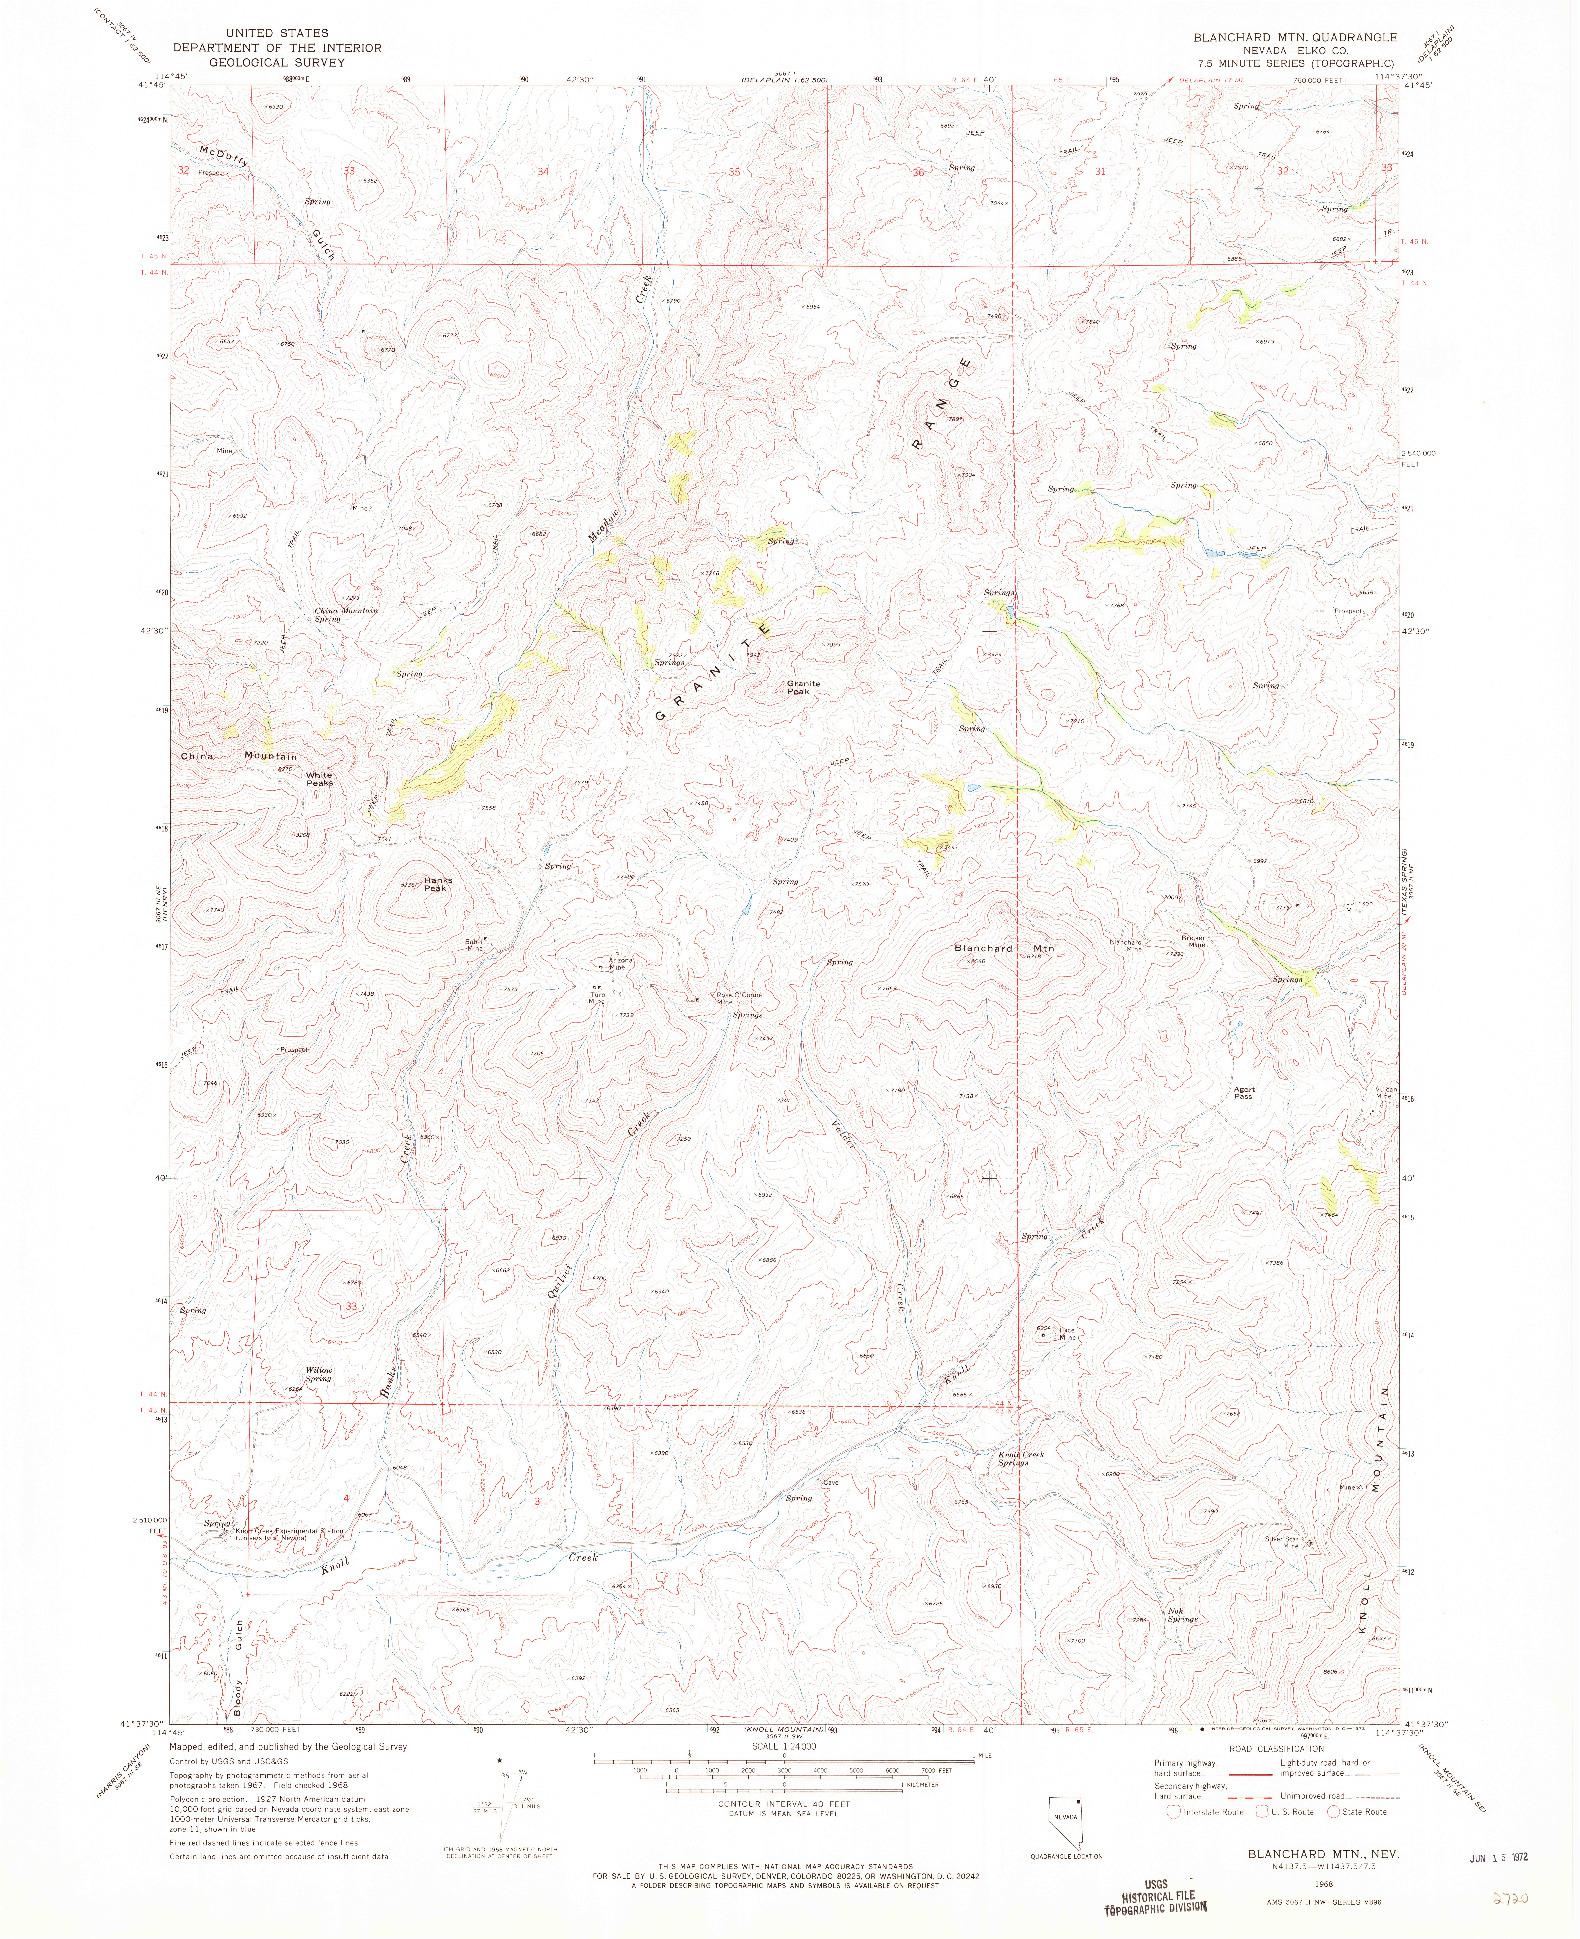 USGS 1:24000-SCALE QUADRANGLE FOR BLANCHARD MTN, NV 1968